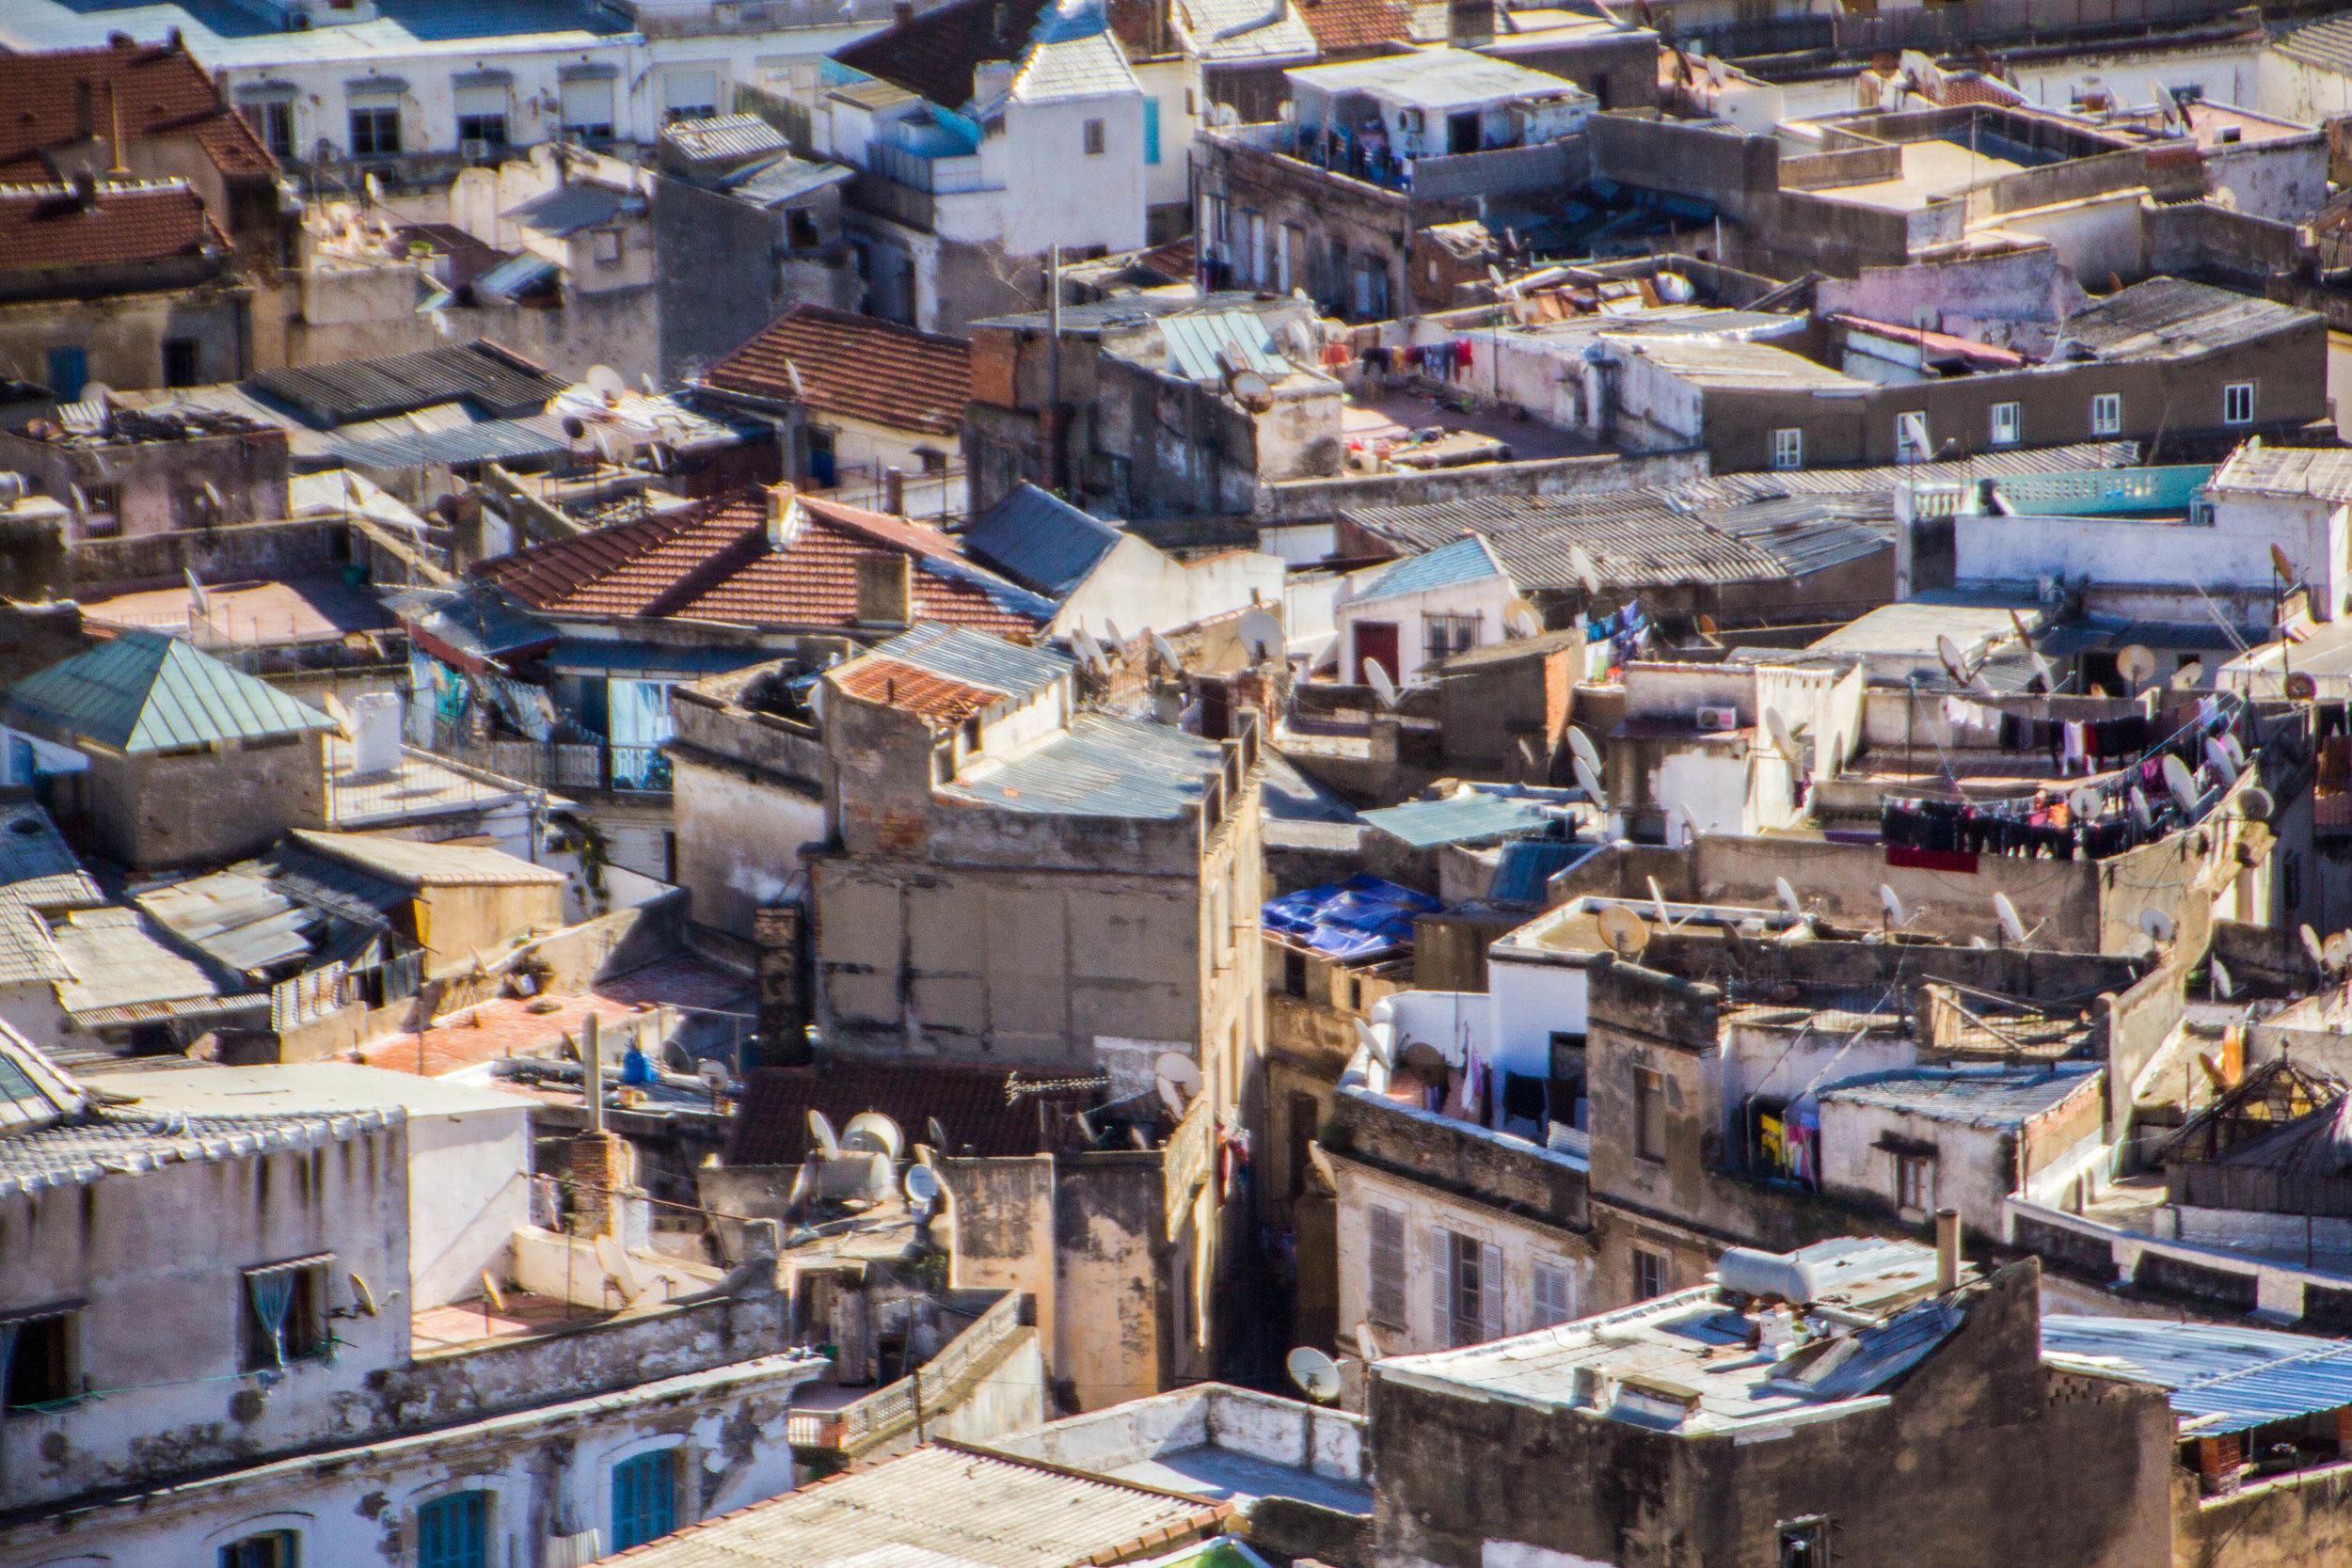 casbah-from-above-algiers-algeria-42.jpg